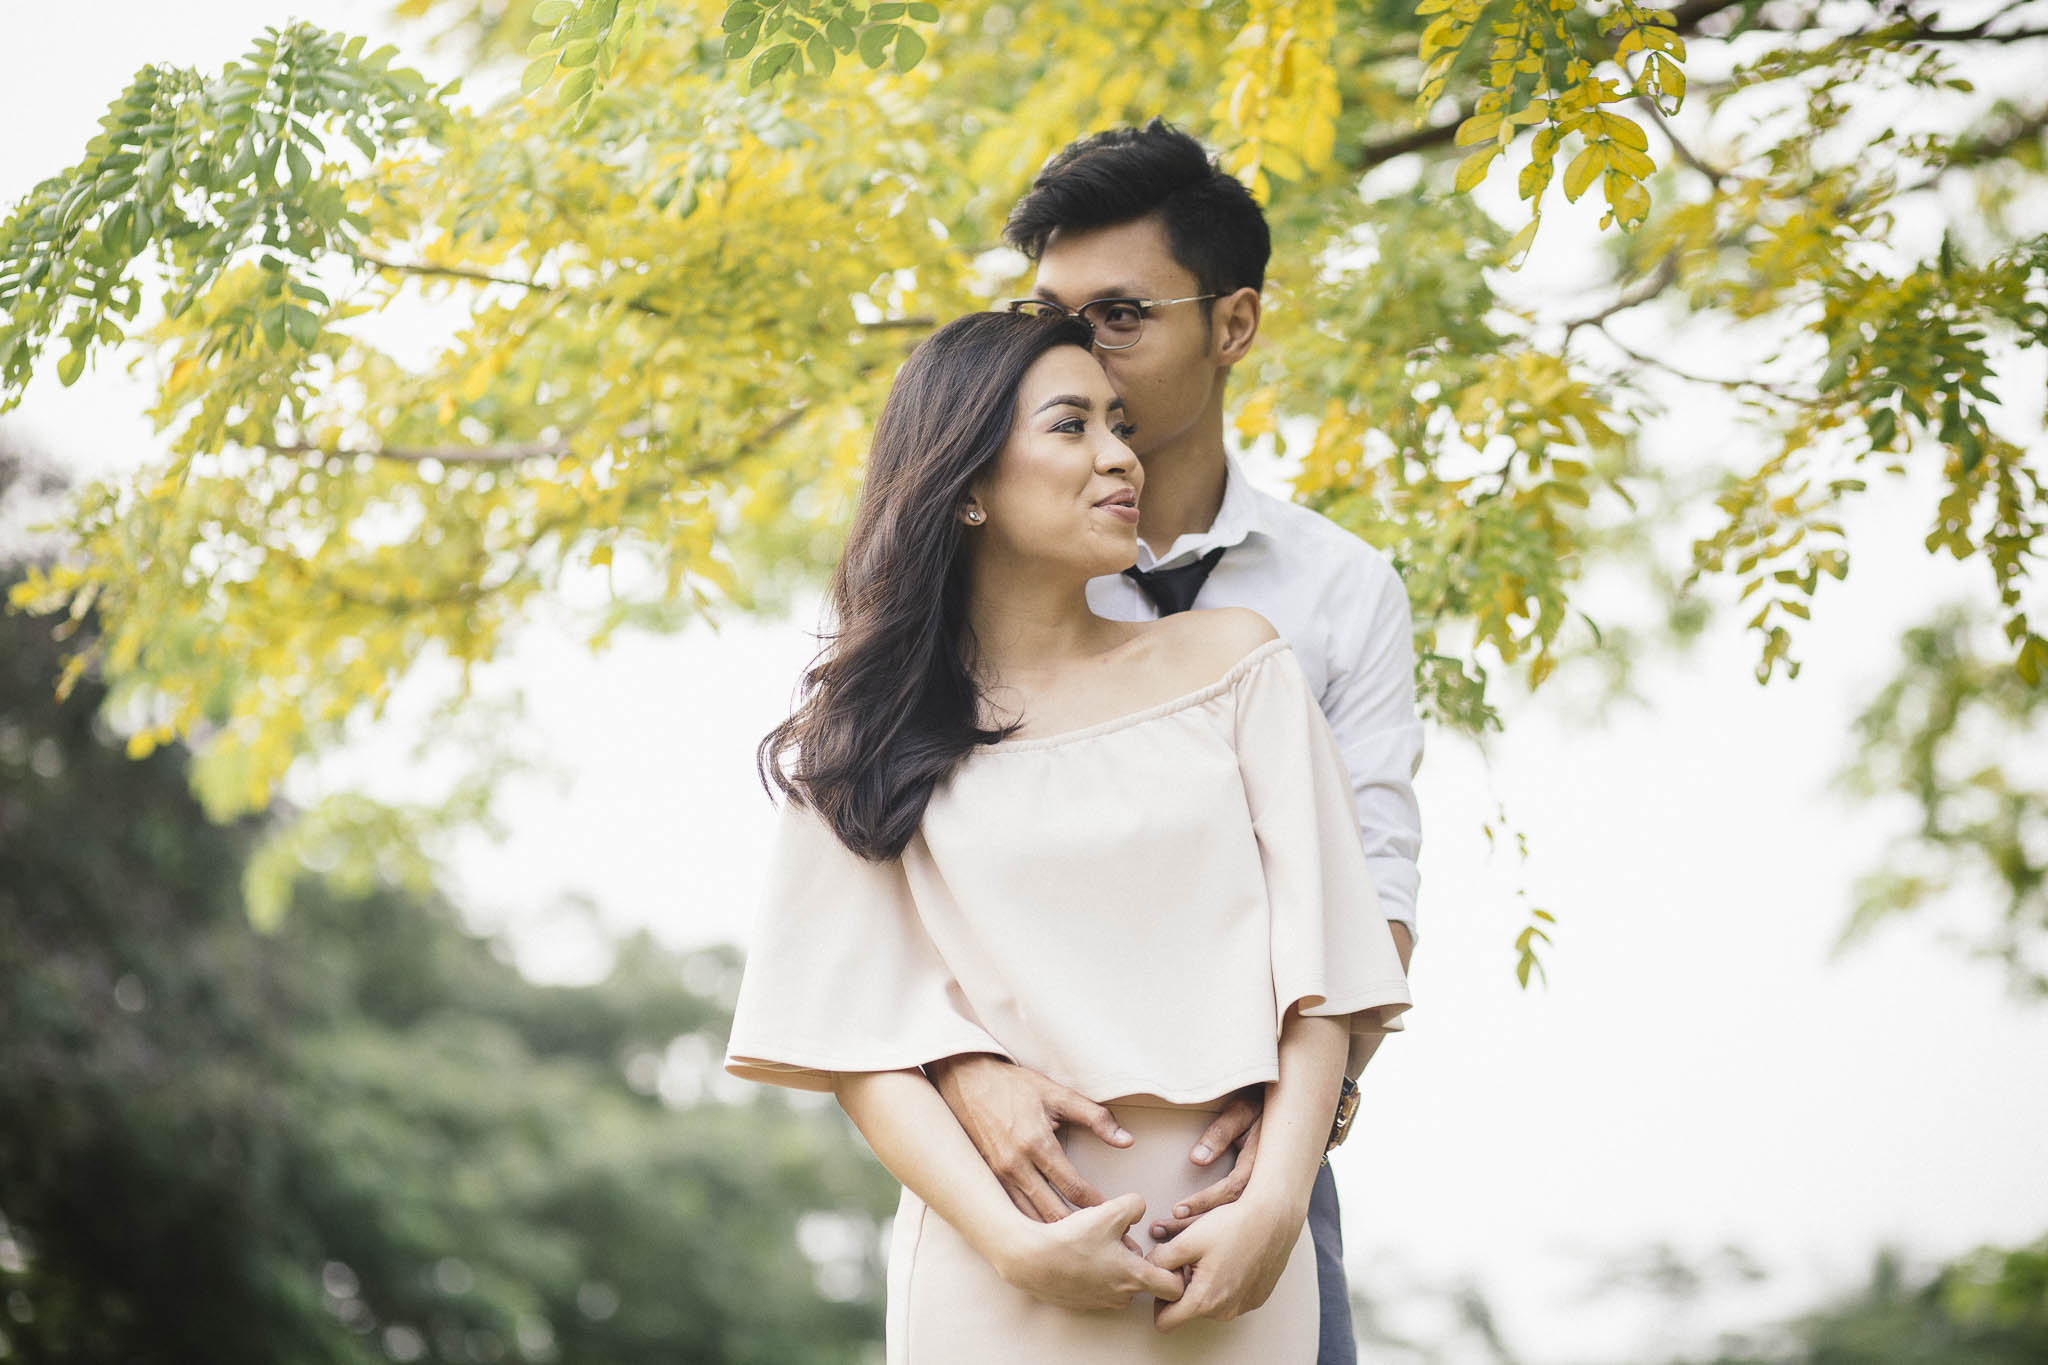 singapore-wedding-photographer-malay-travel-adli-tashah-21.jpg